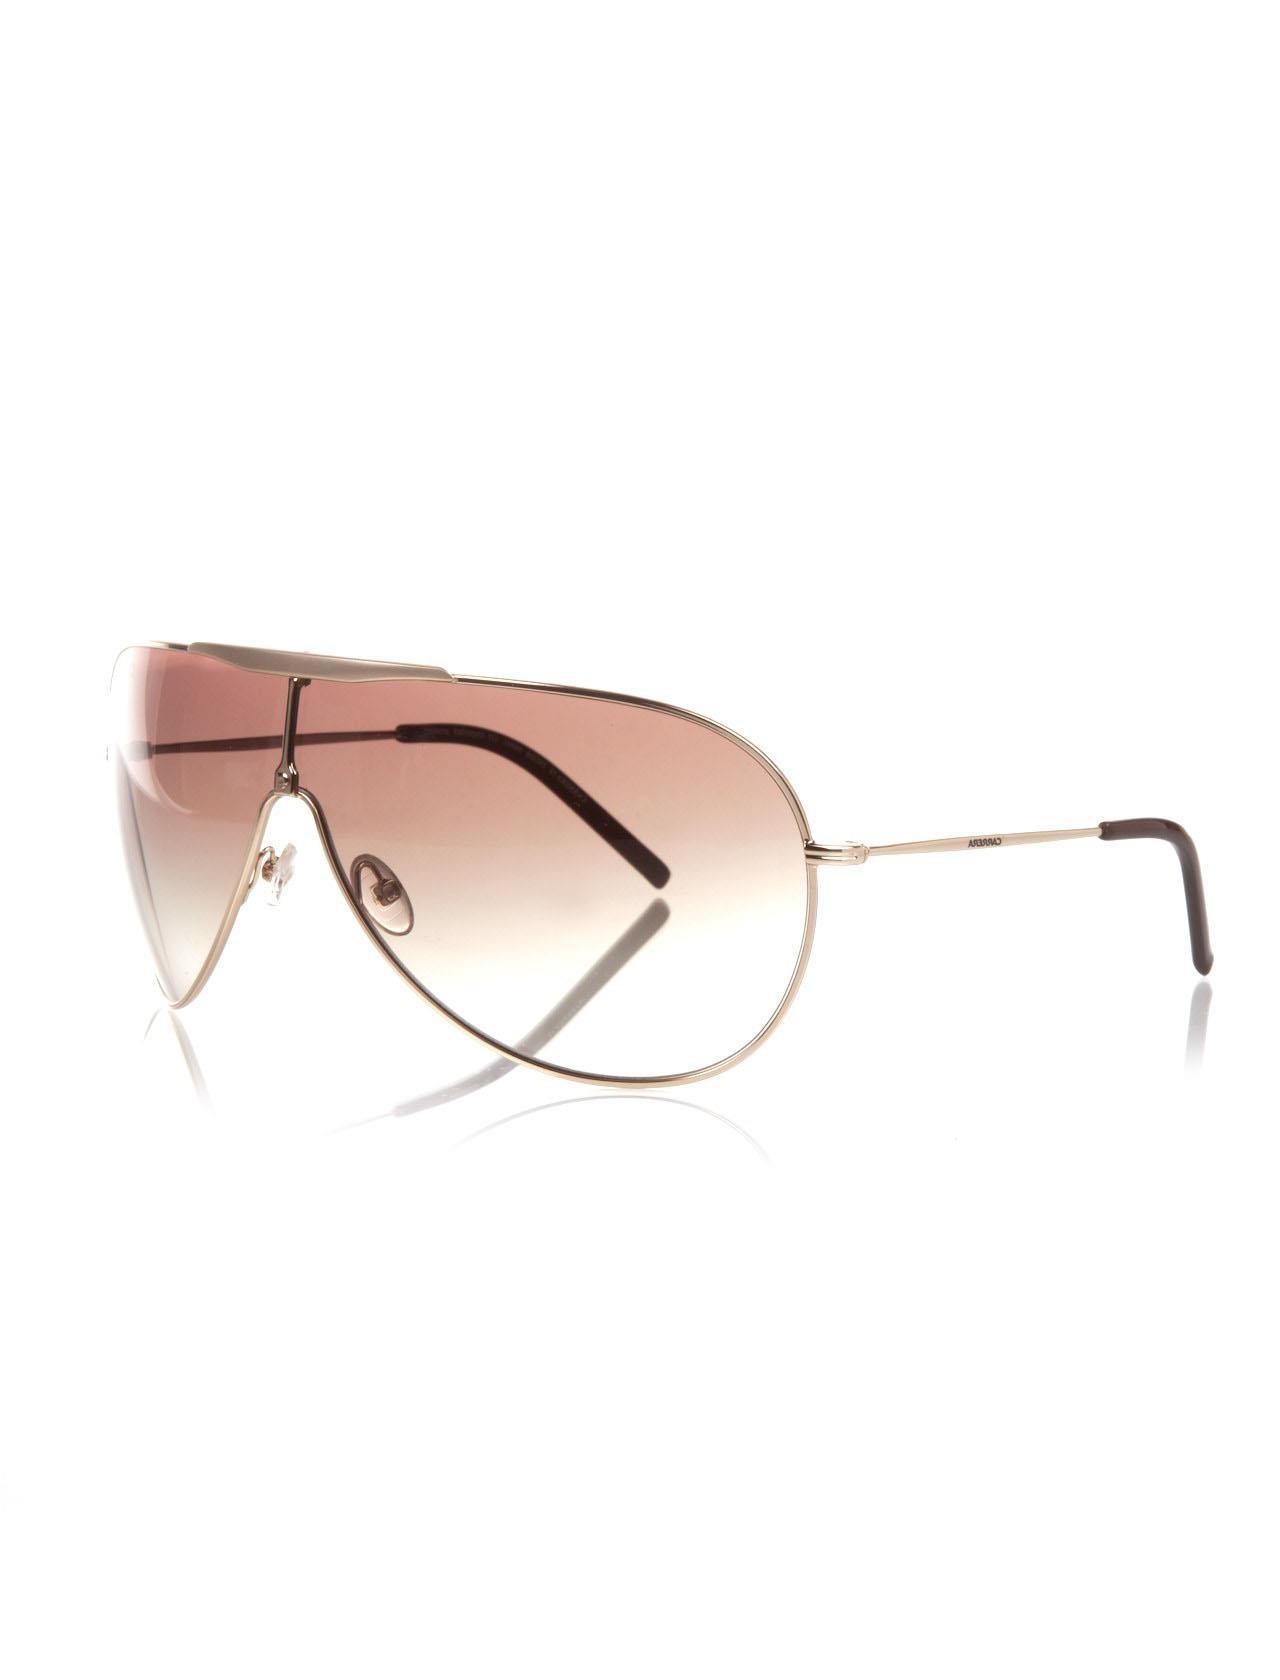 Unisex sunglasses cr 18 j5g 99 db unibody gold organic unibody pilot 99-11-125 carrera